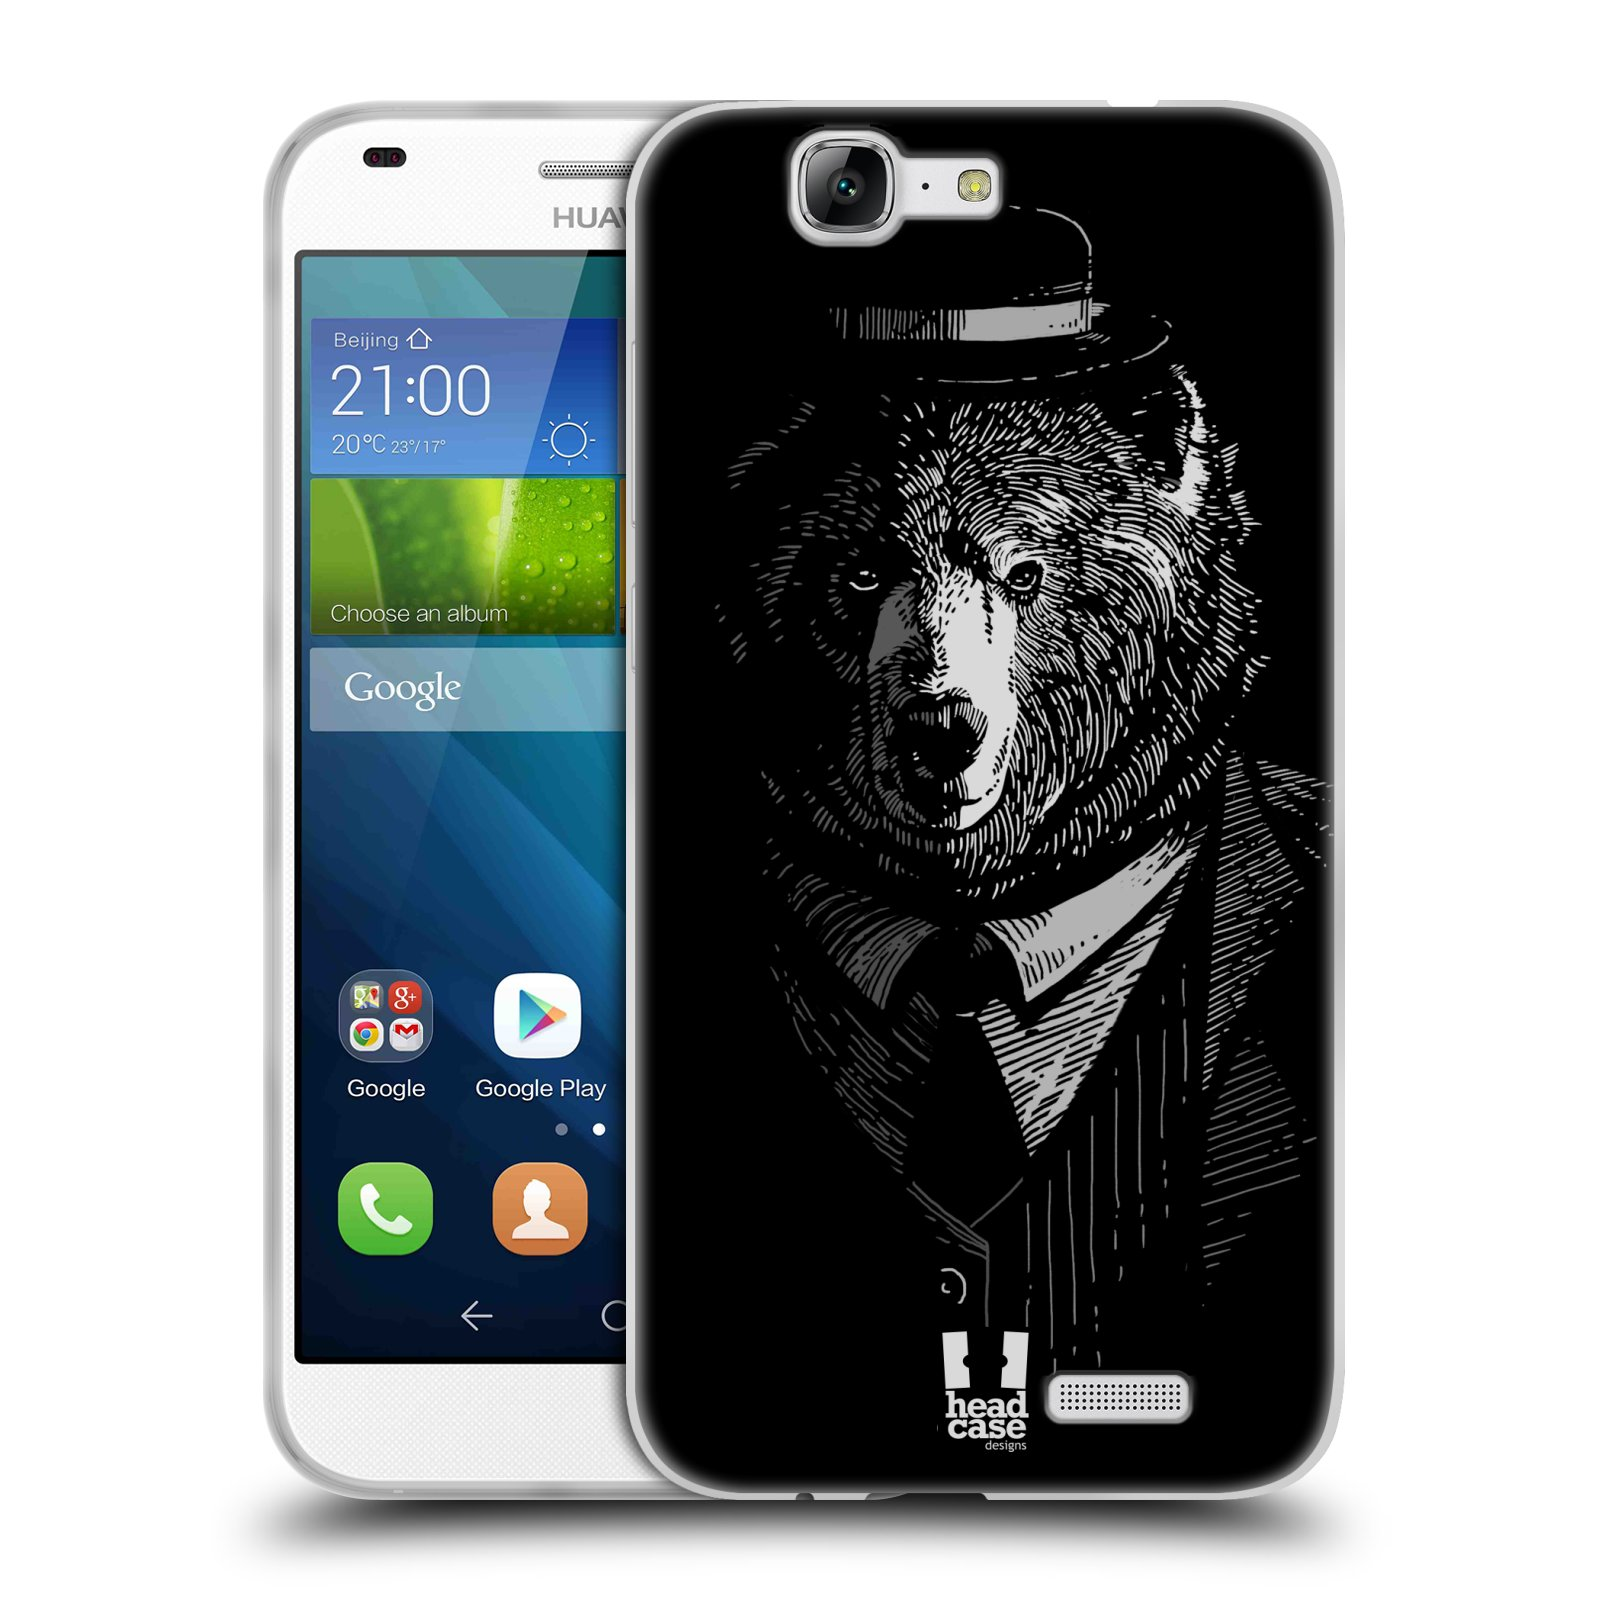 Silikonové pouzdro na mobil Huawei Ascend G7 HEAD CASE MEDVĚD V KVÁDRU (Silikonový kryt či obal na mobilní telefon Huawei Ascend G7)